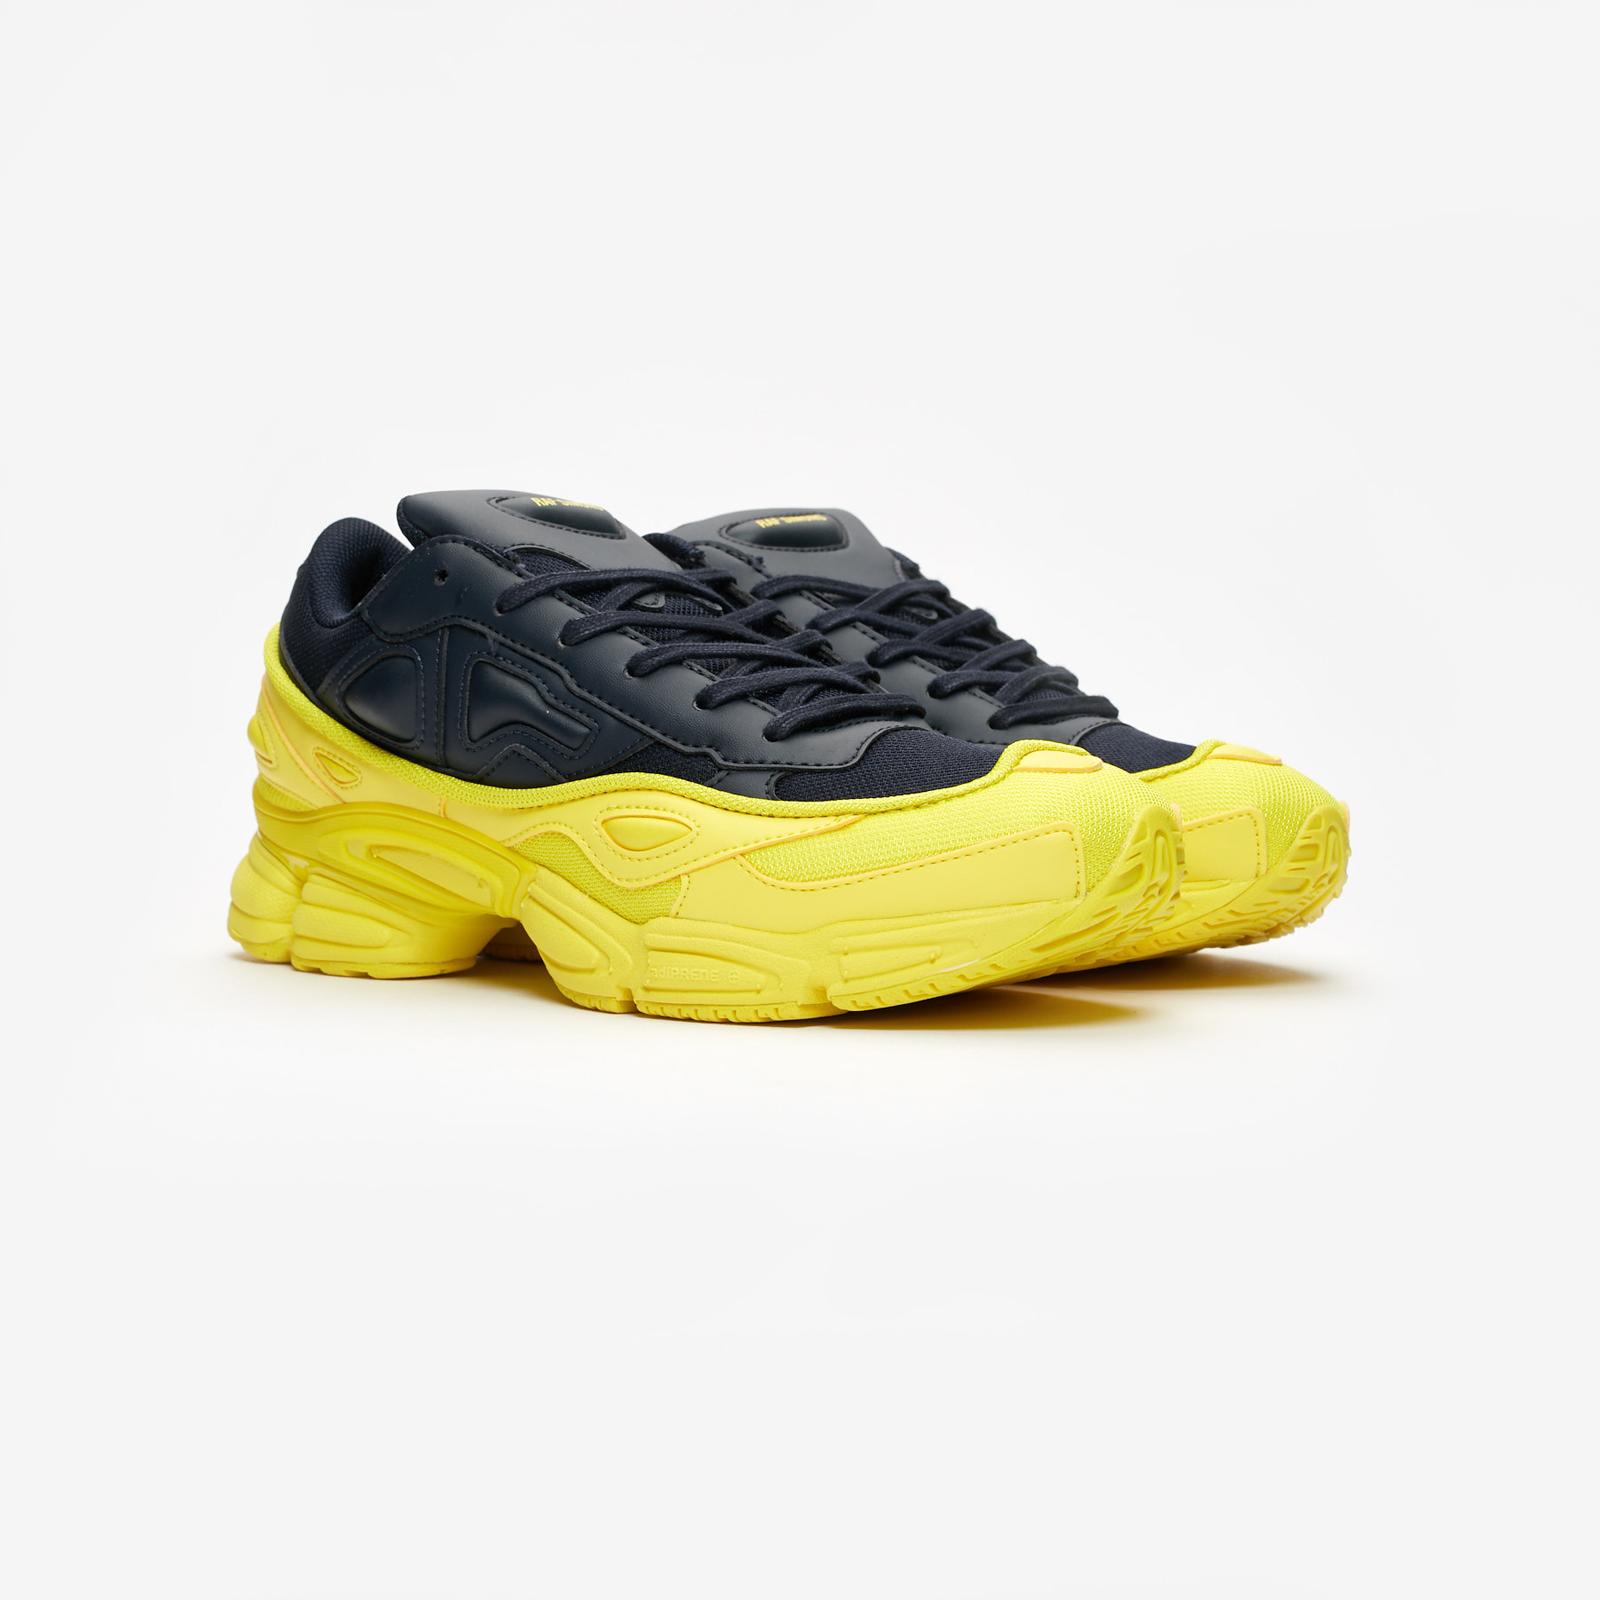 961109ff4f3 adidas Raf Simons Ozweego - F34267 - Sneakersnstuff